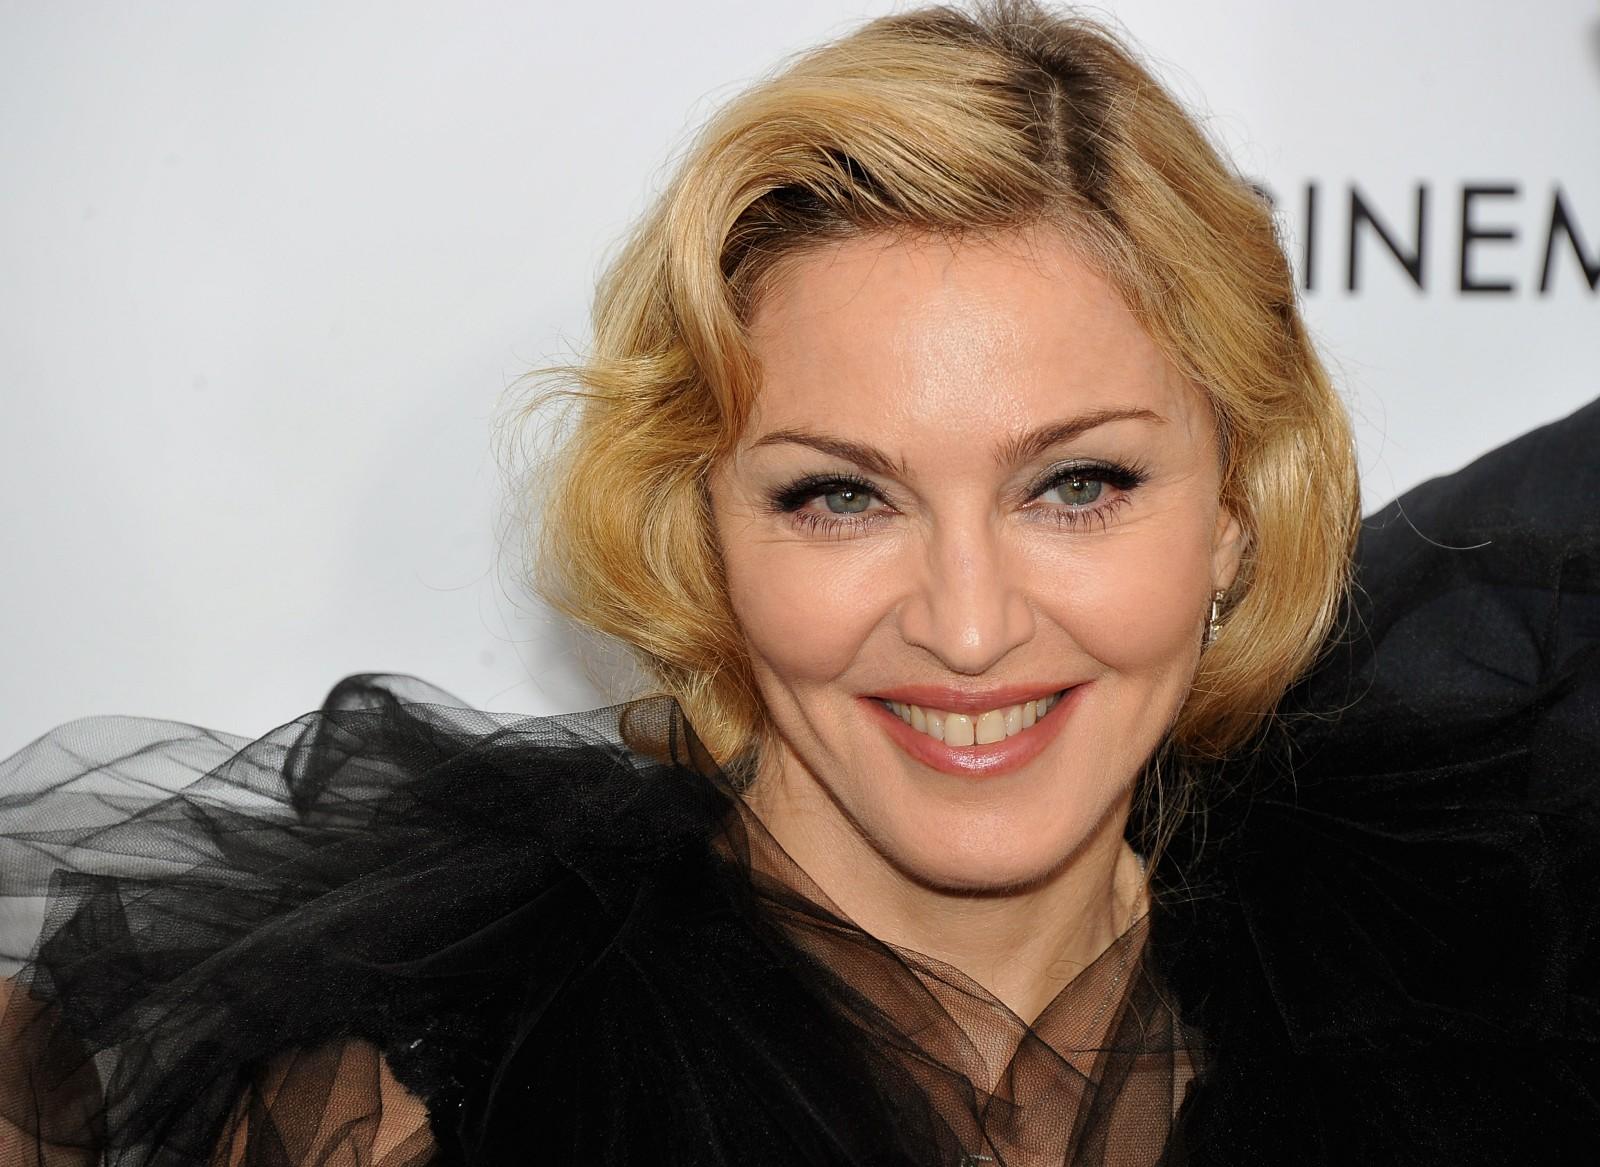 Madonna yeniden Guinness Rekorlar Kitabı'nda!